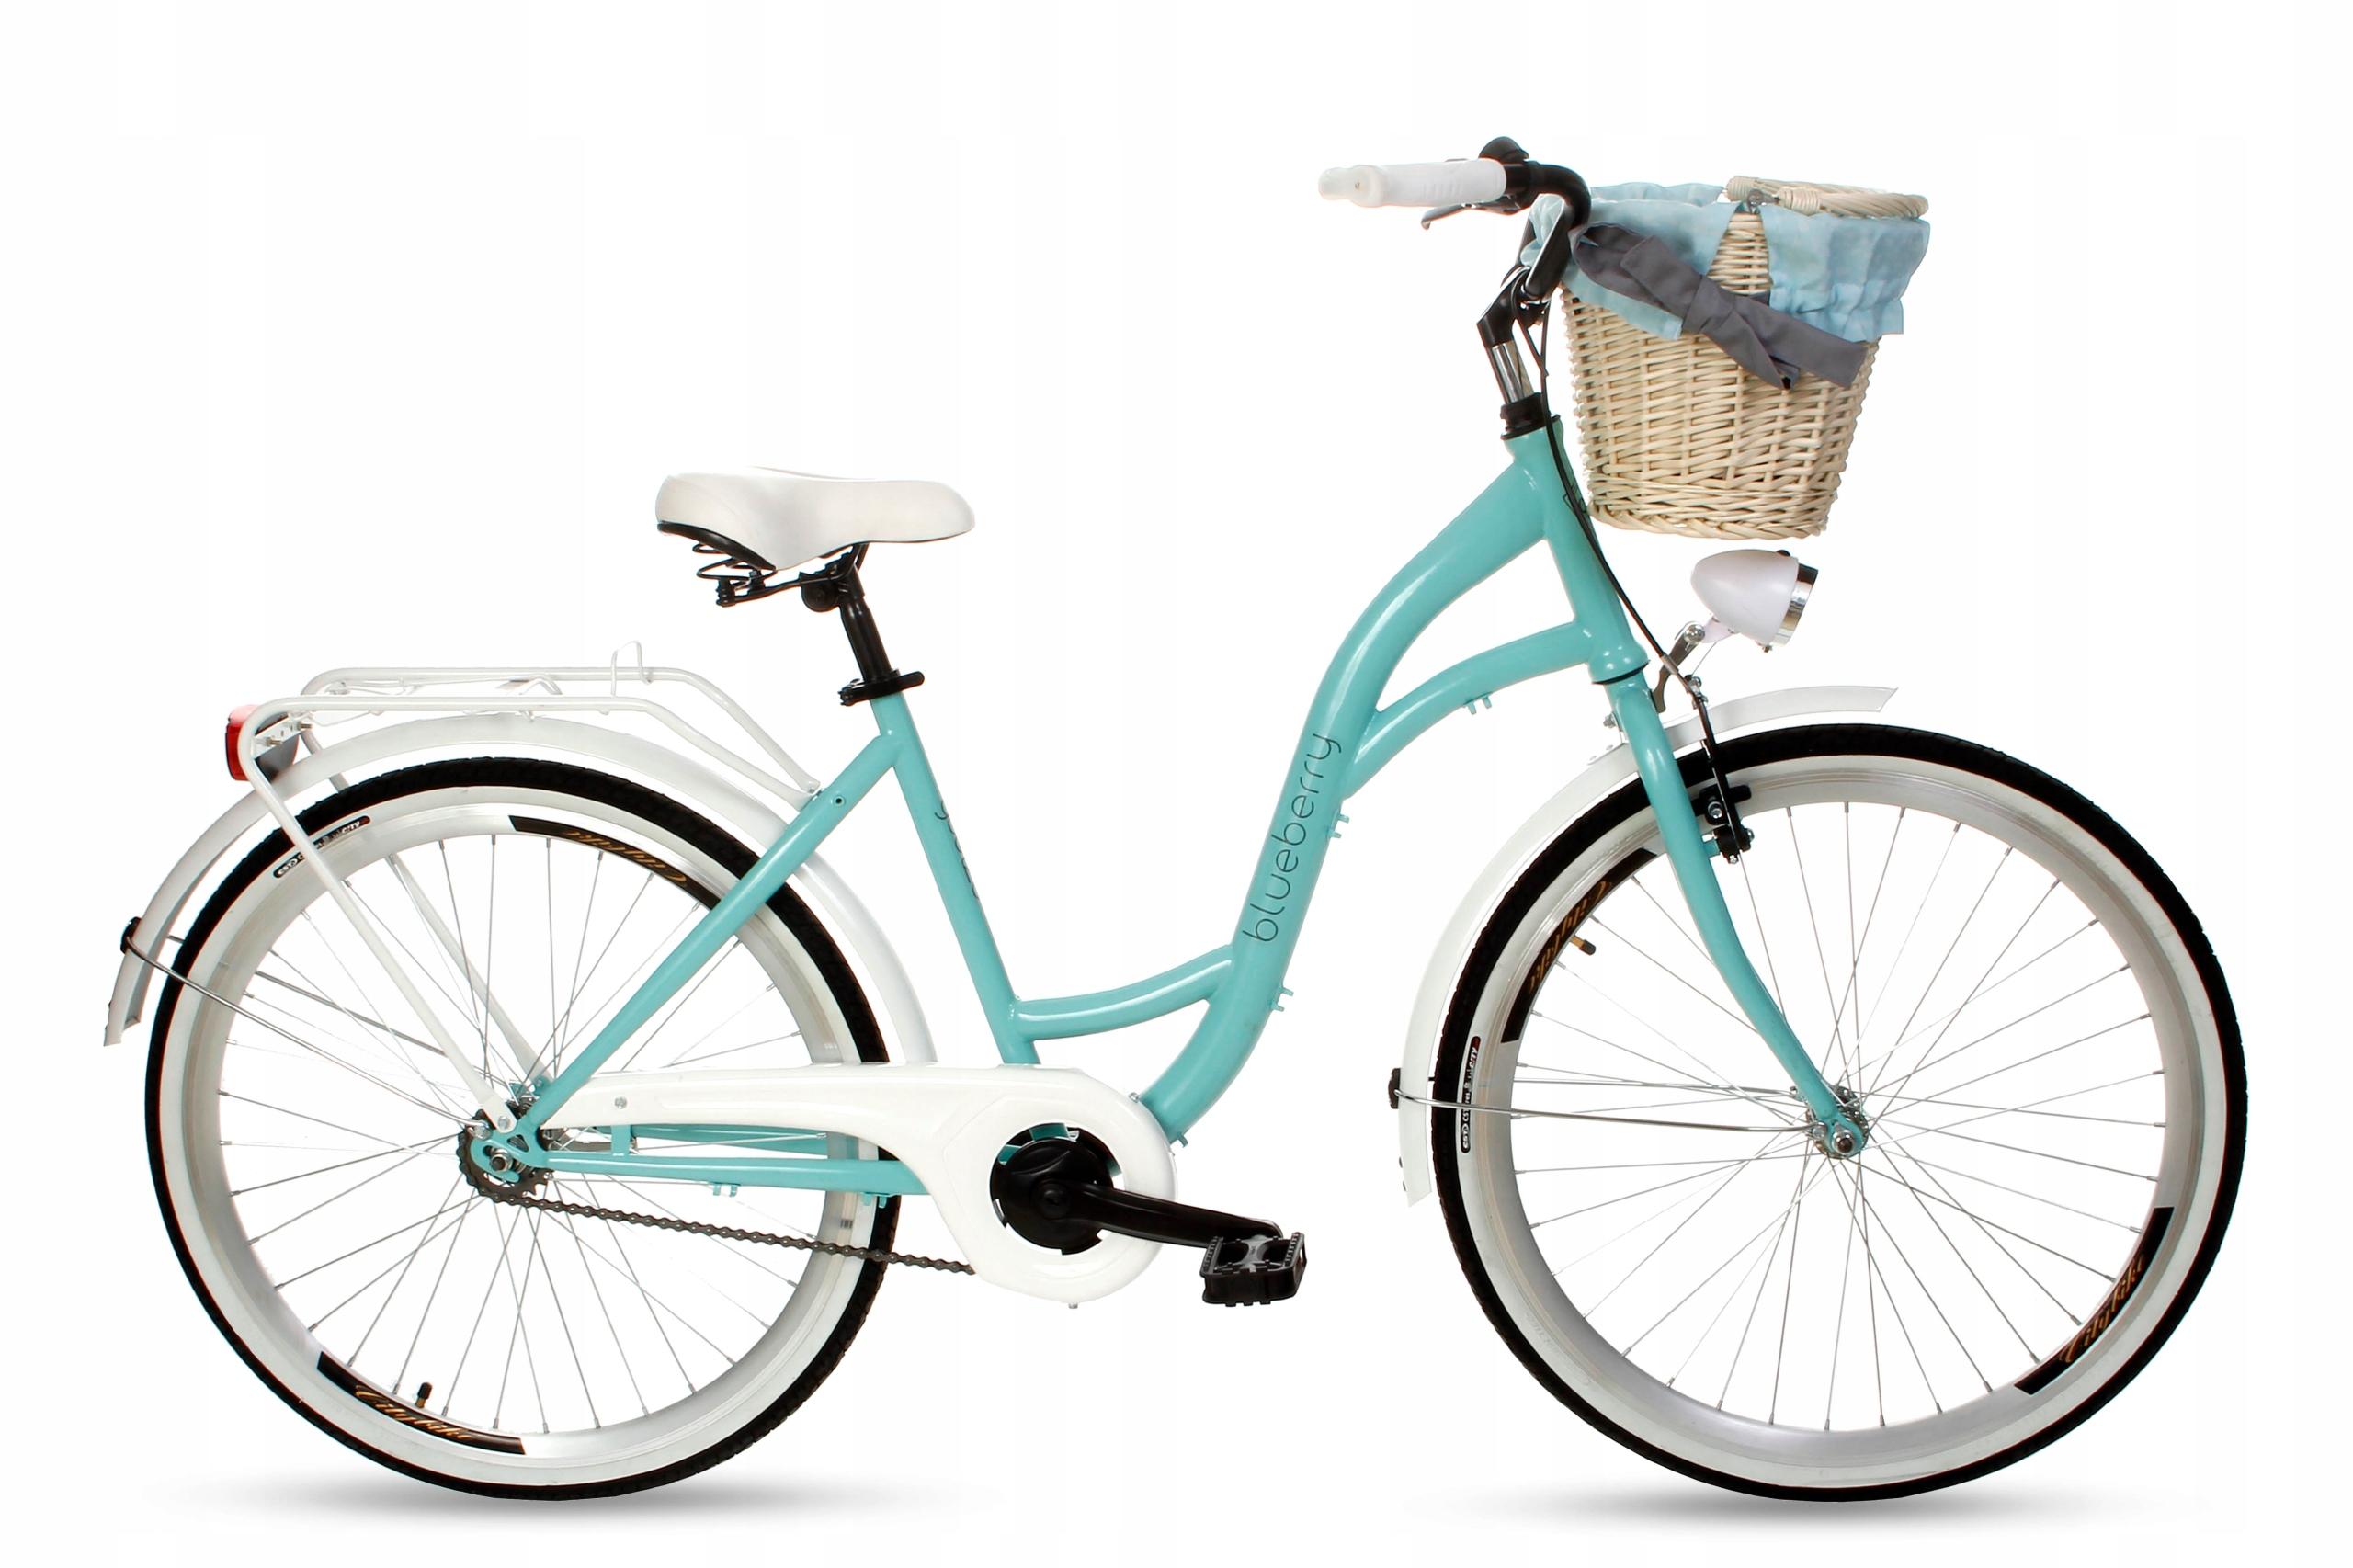 Dámsky mestský bicykel Goetze BLUEBERRY 26 košík!  Veľkosť rámu 17 palcov